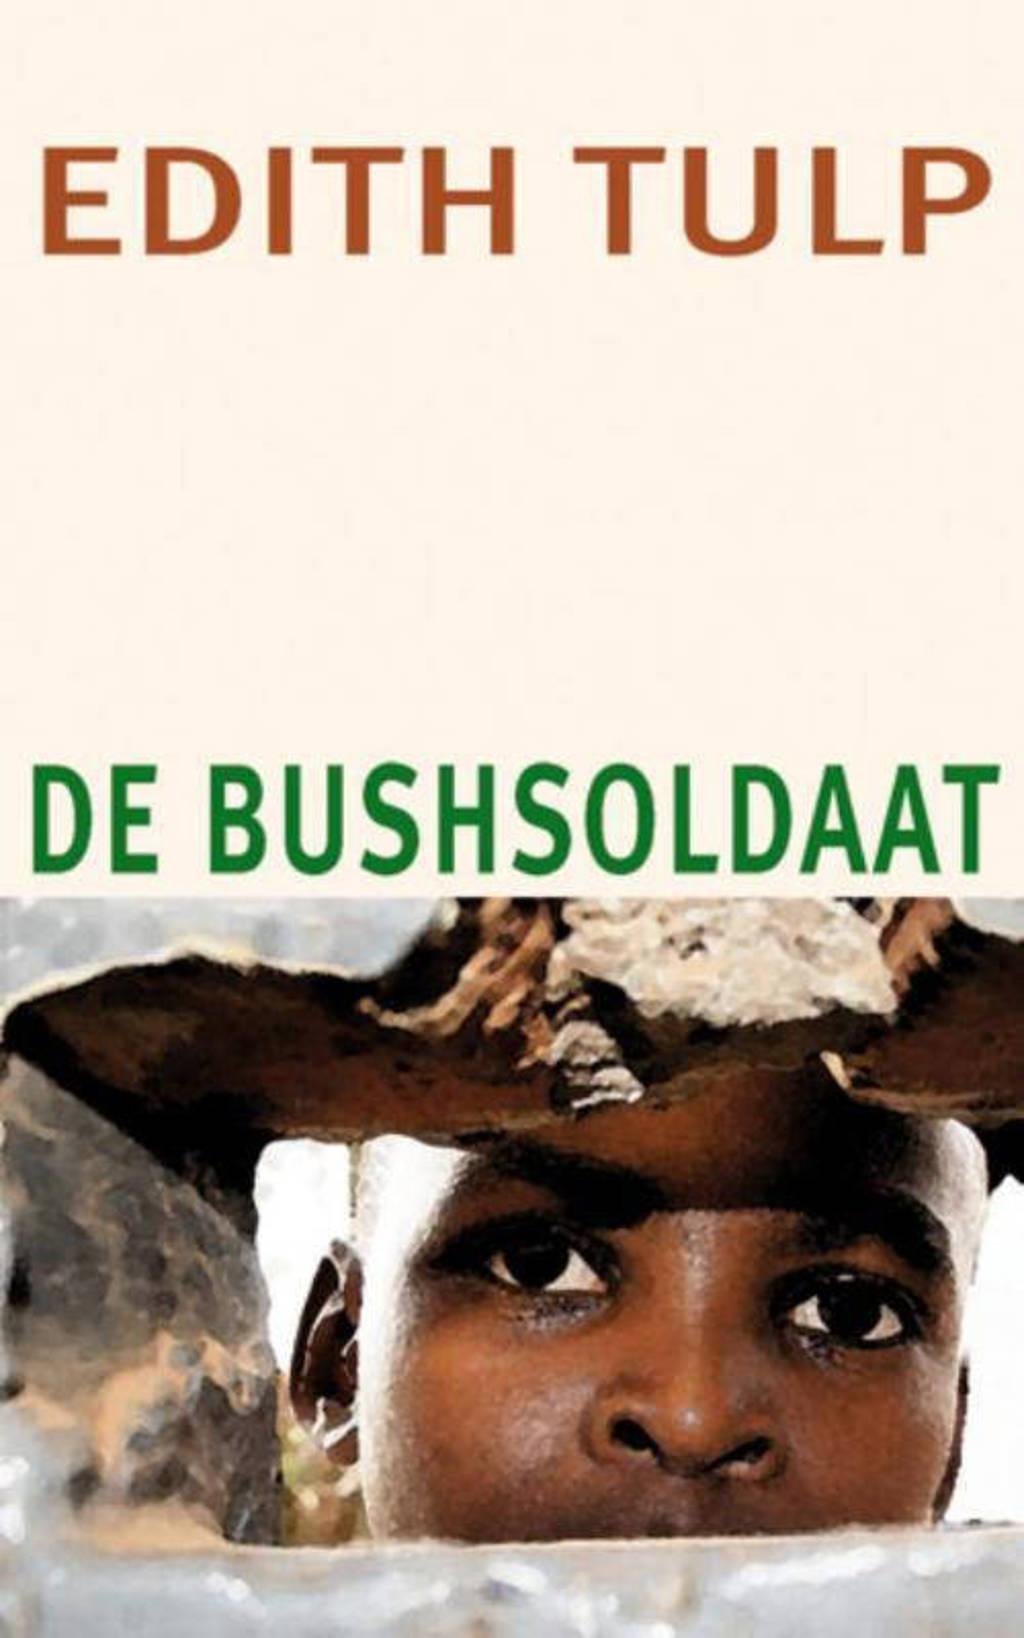 De bushsoldaat - Edith Tulp